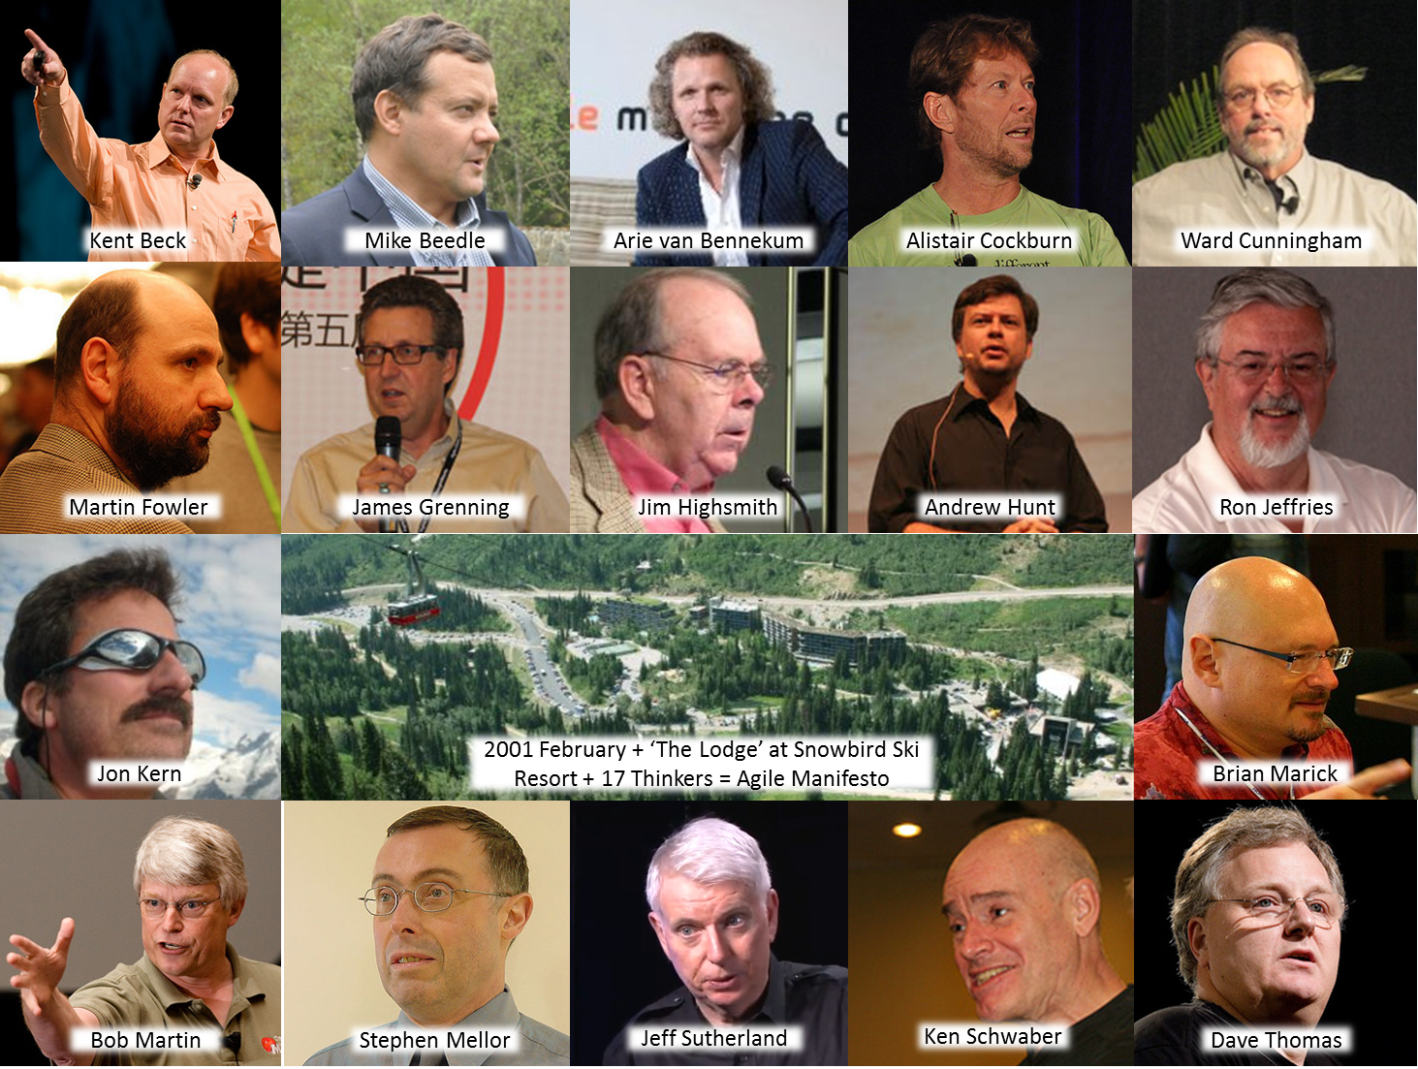 Autoři Manifestu (zdroj: http://setandbma.wordpress.com/2012/03/23/agile-history/)